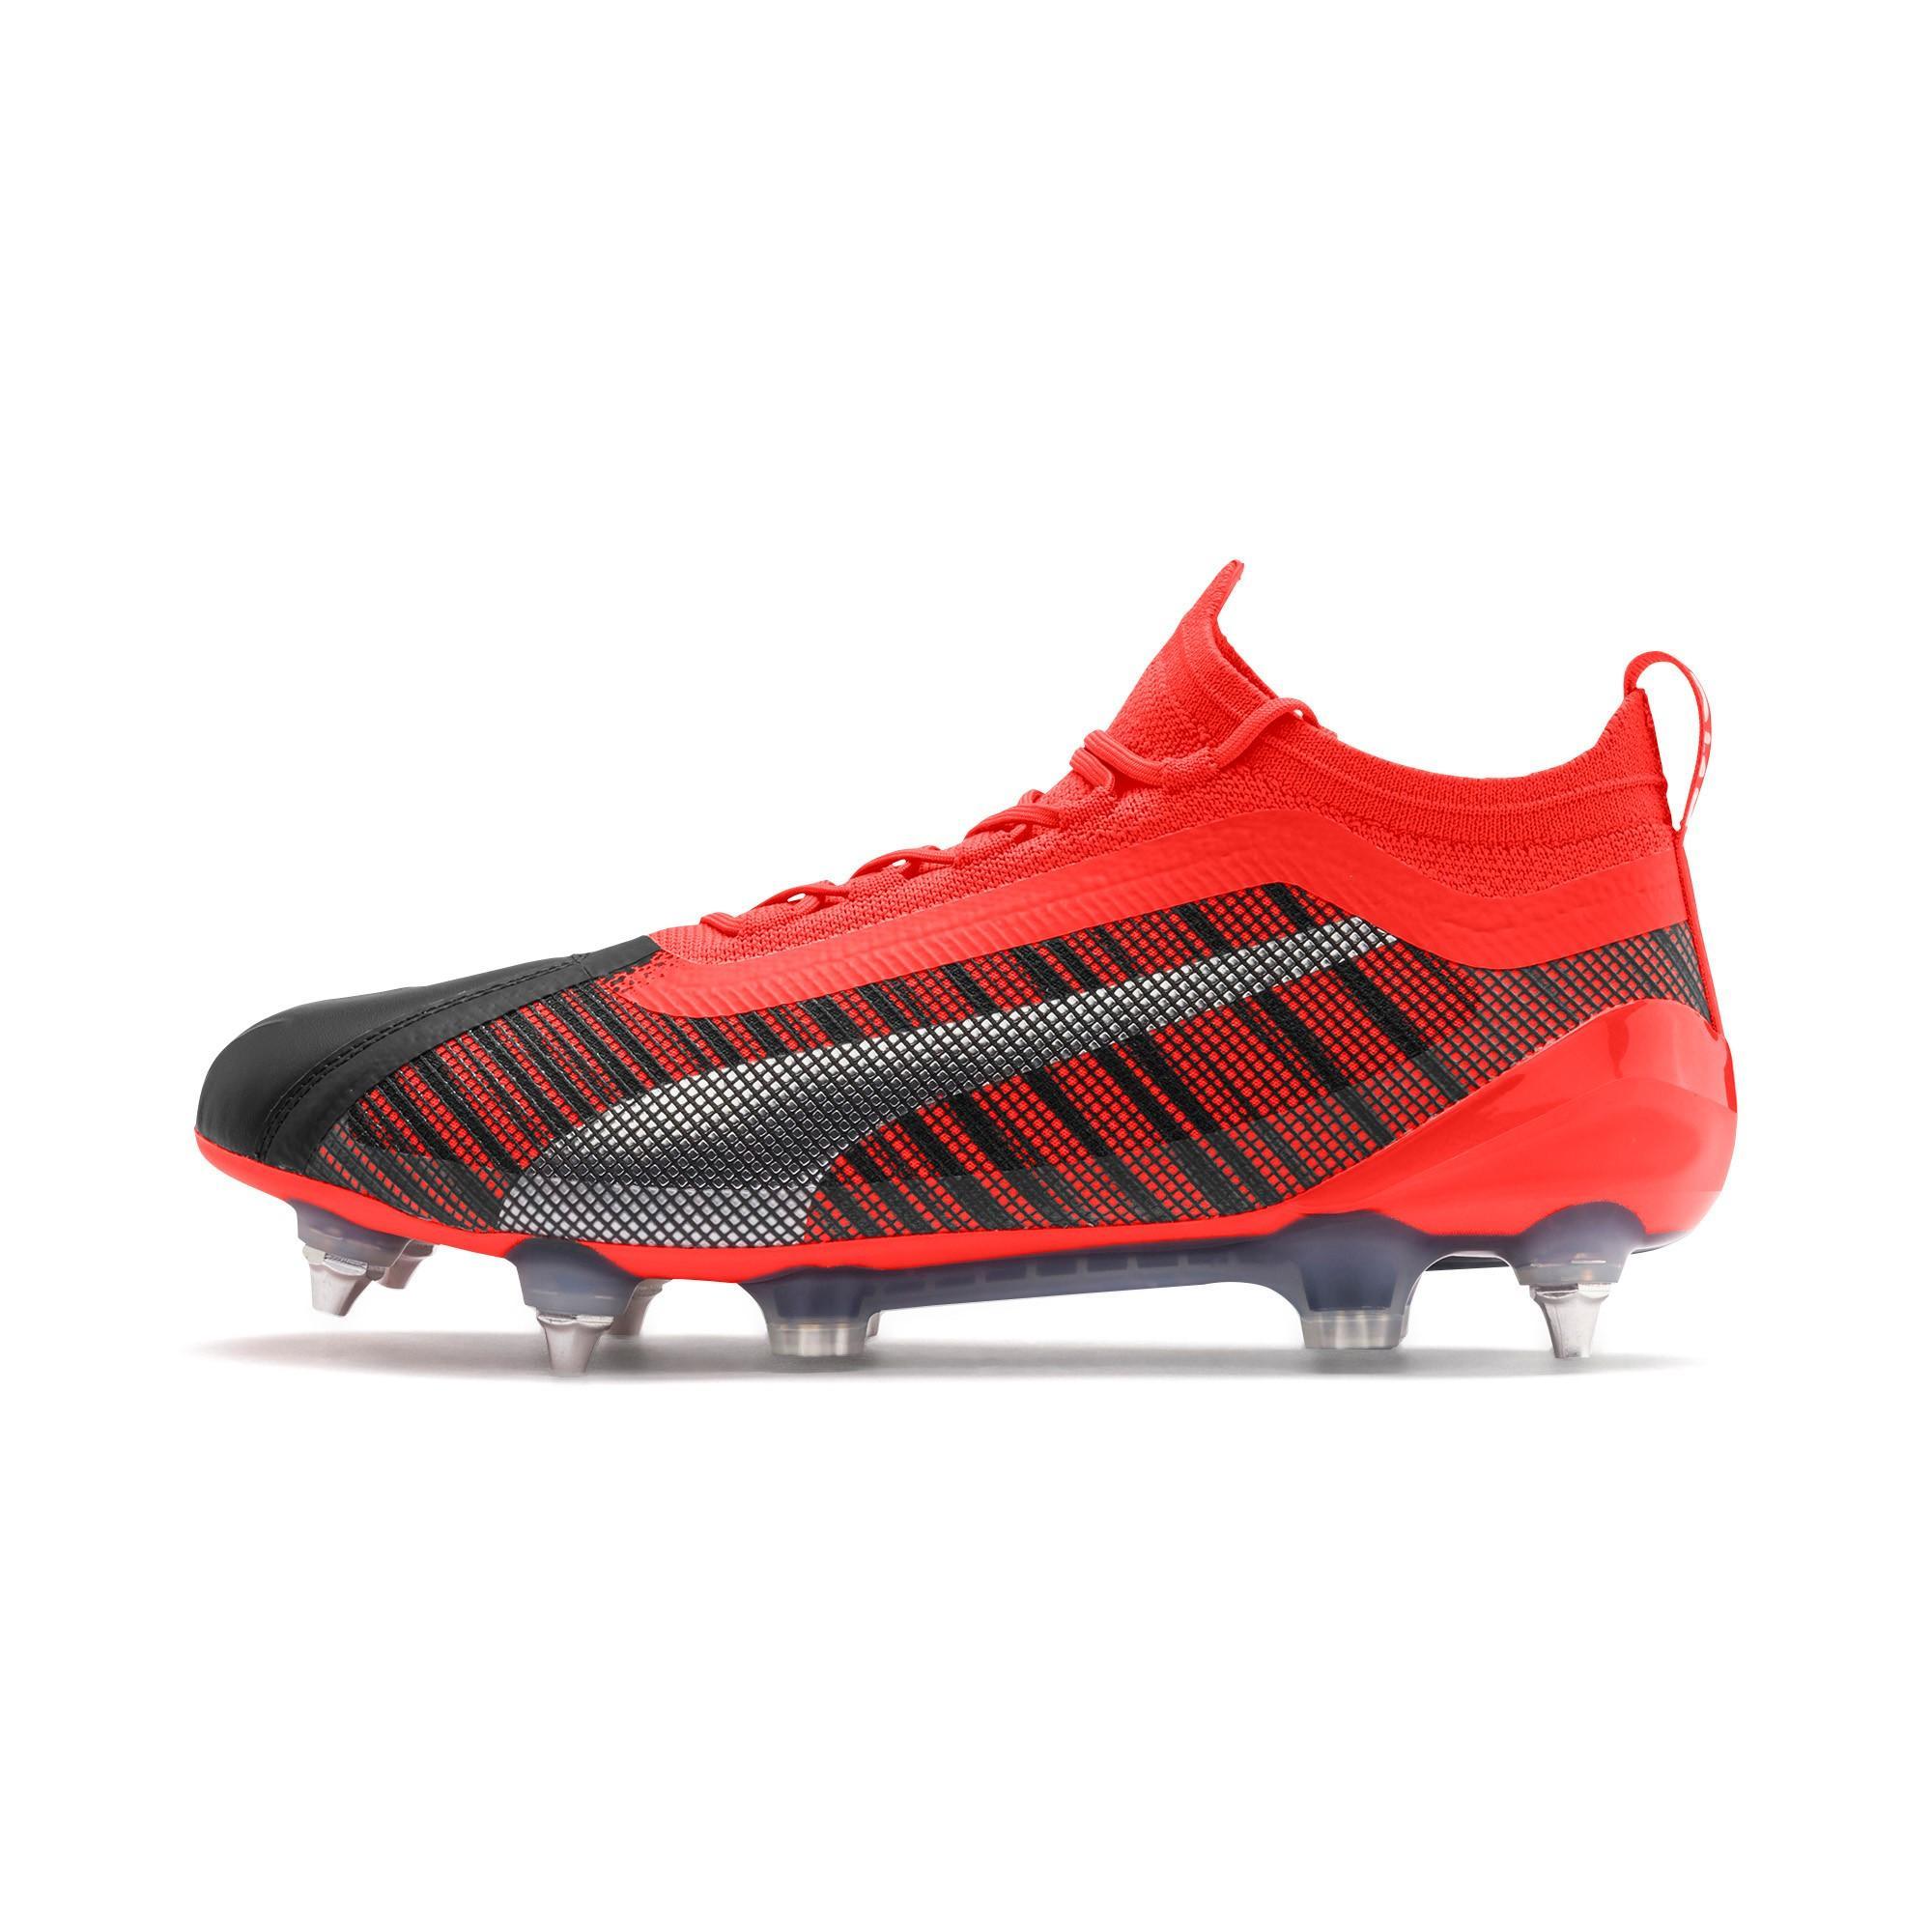 Puma Chaussures De Football One 5.1 Mxsg